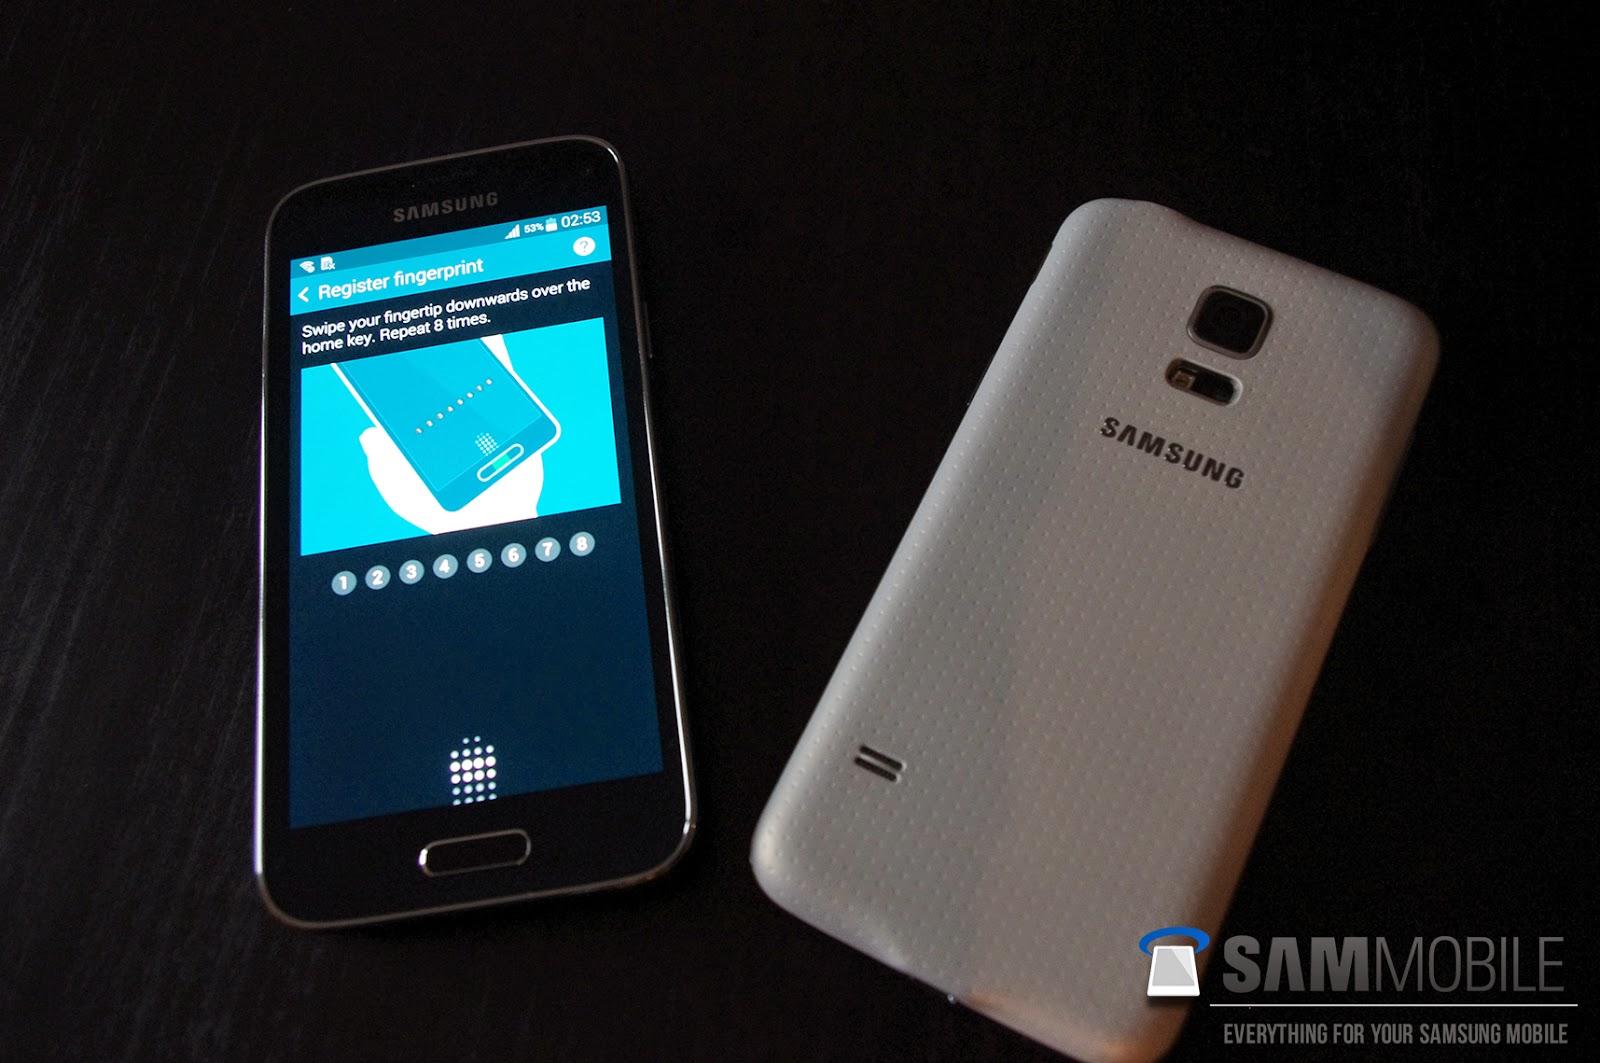 samsung-galaxy-s5-mini-4.5-inch-720p